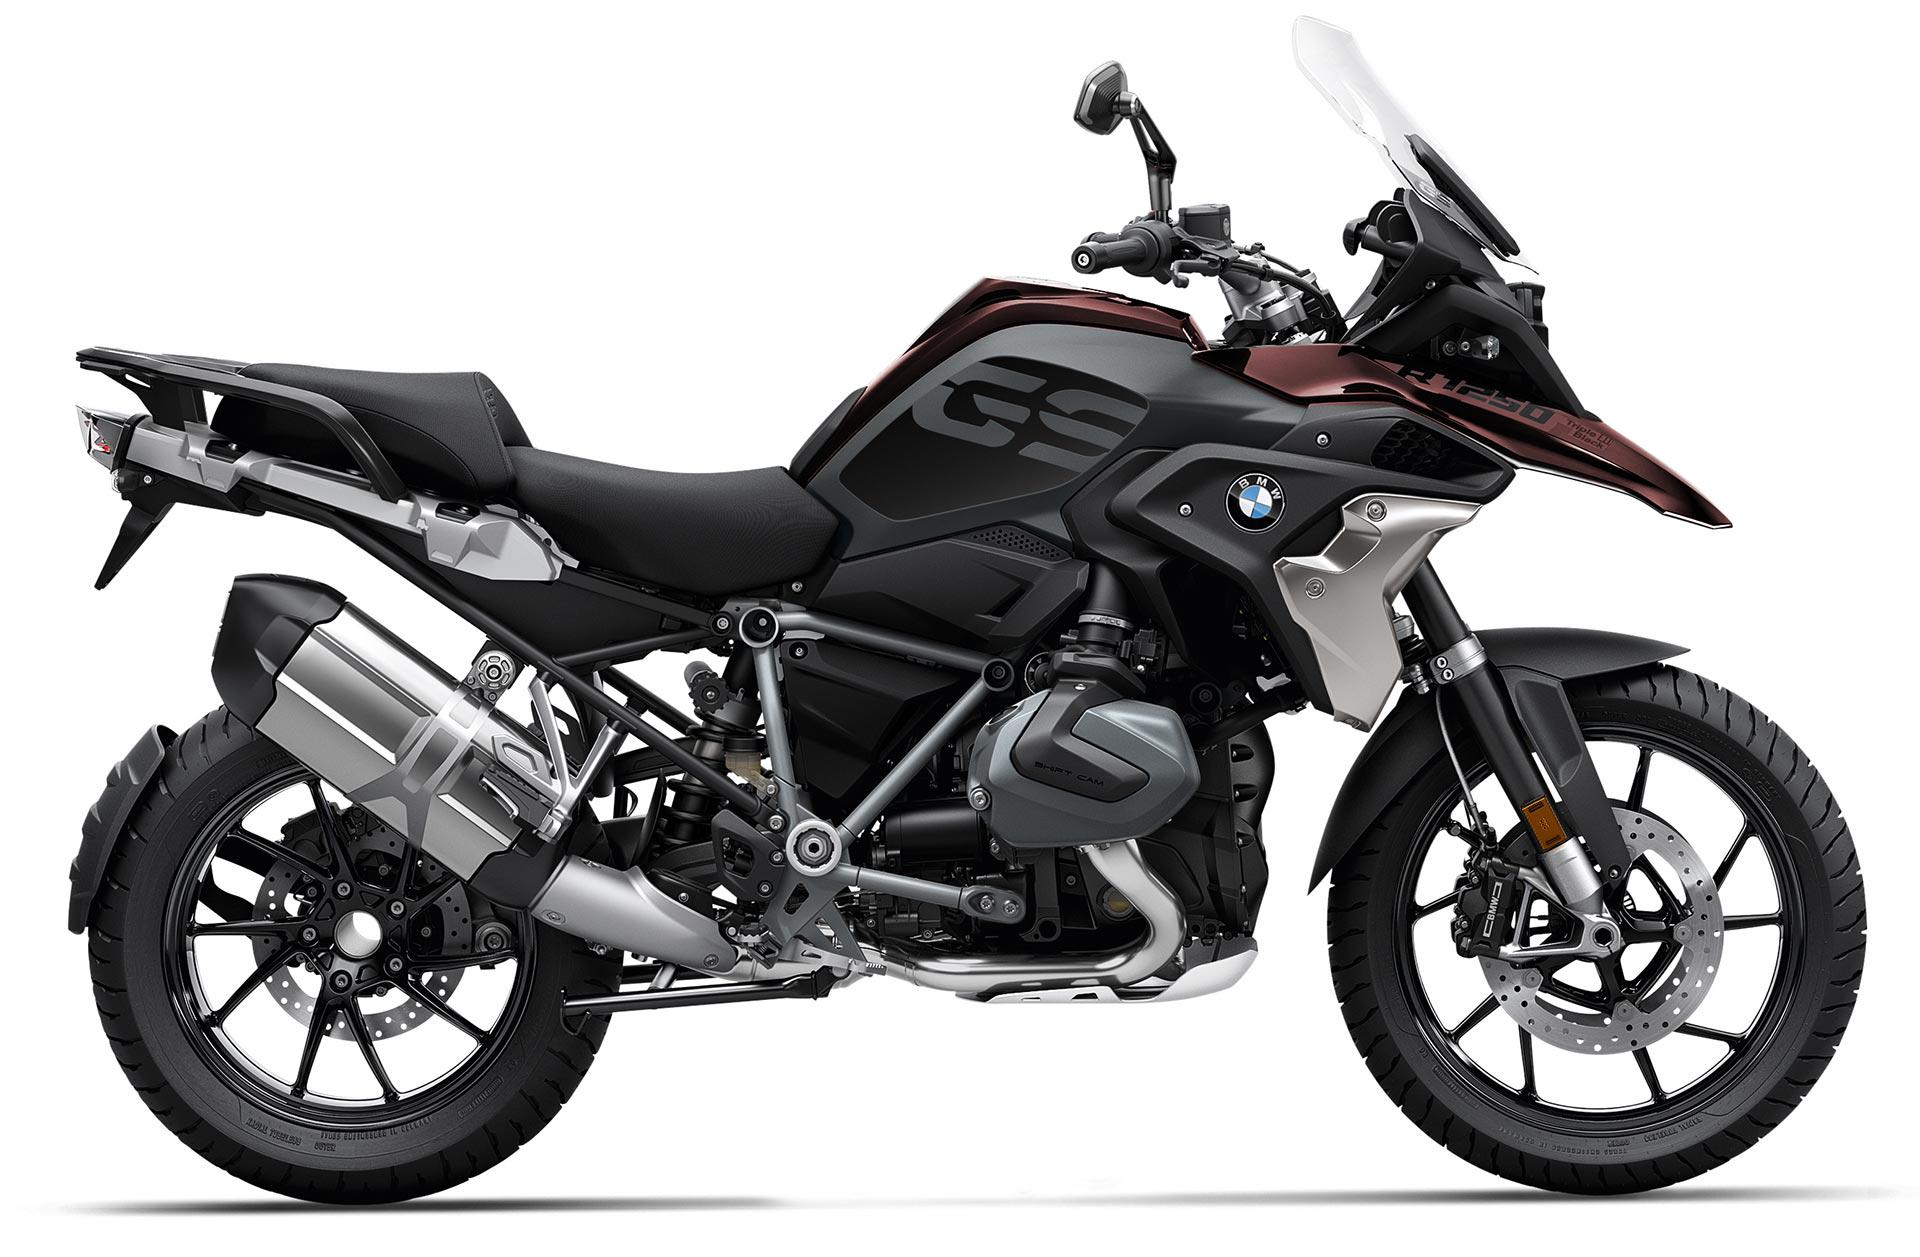 2021-BMW-R1250GS-TripleBlack-Braun.png